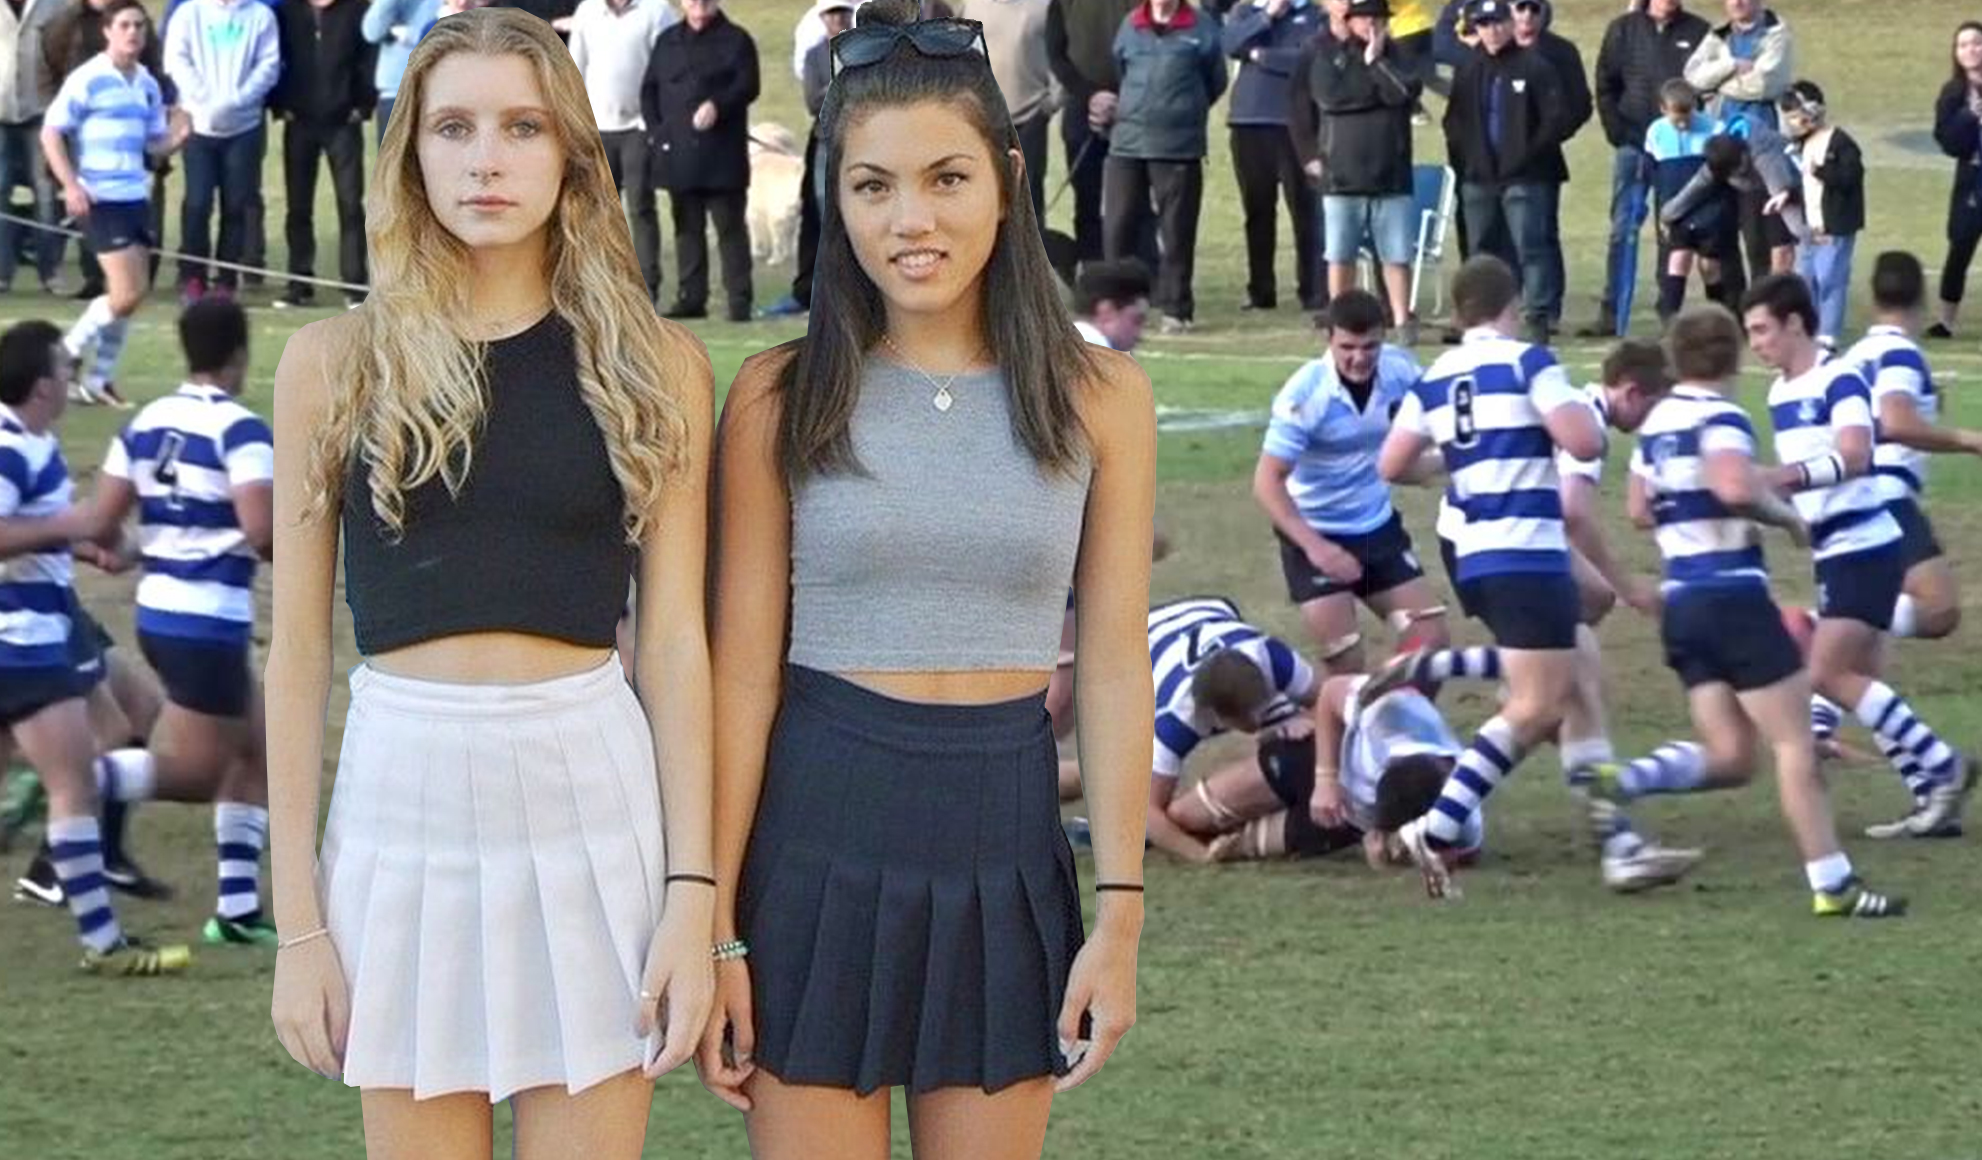 Exploited high school girls